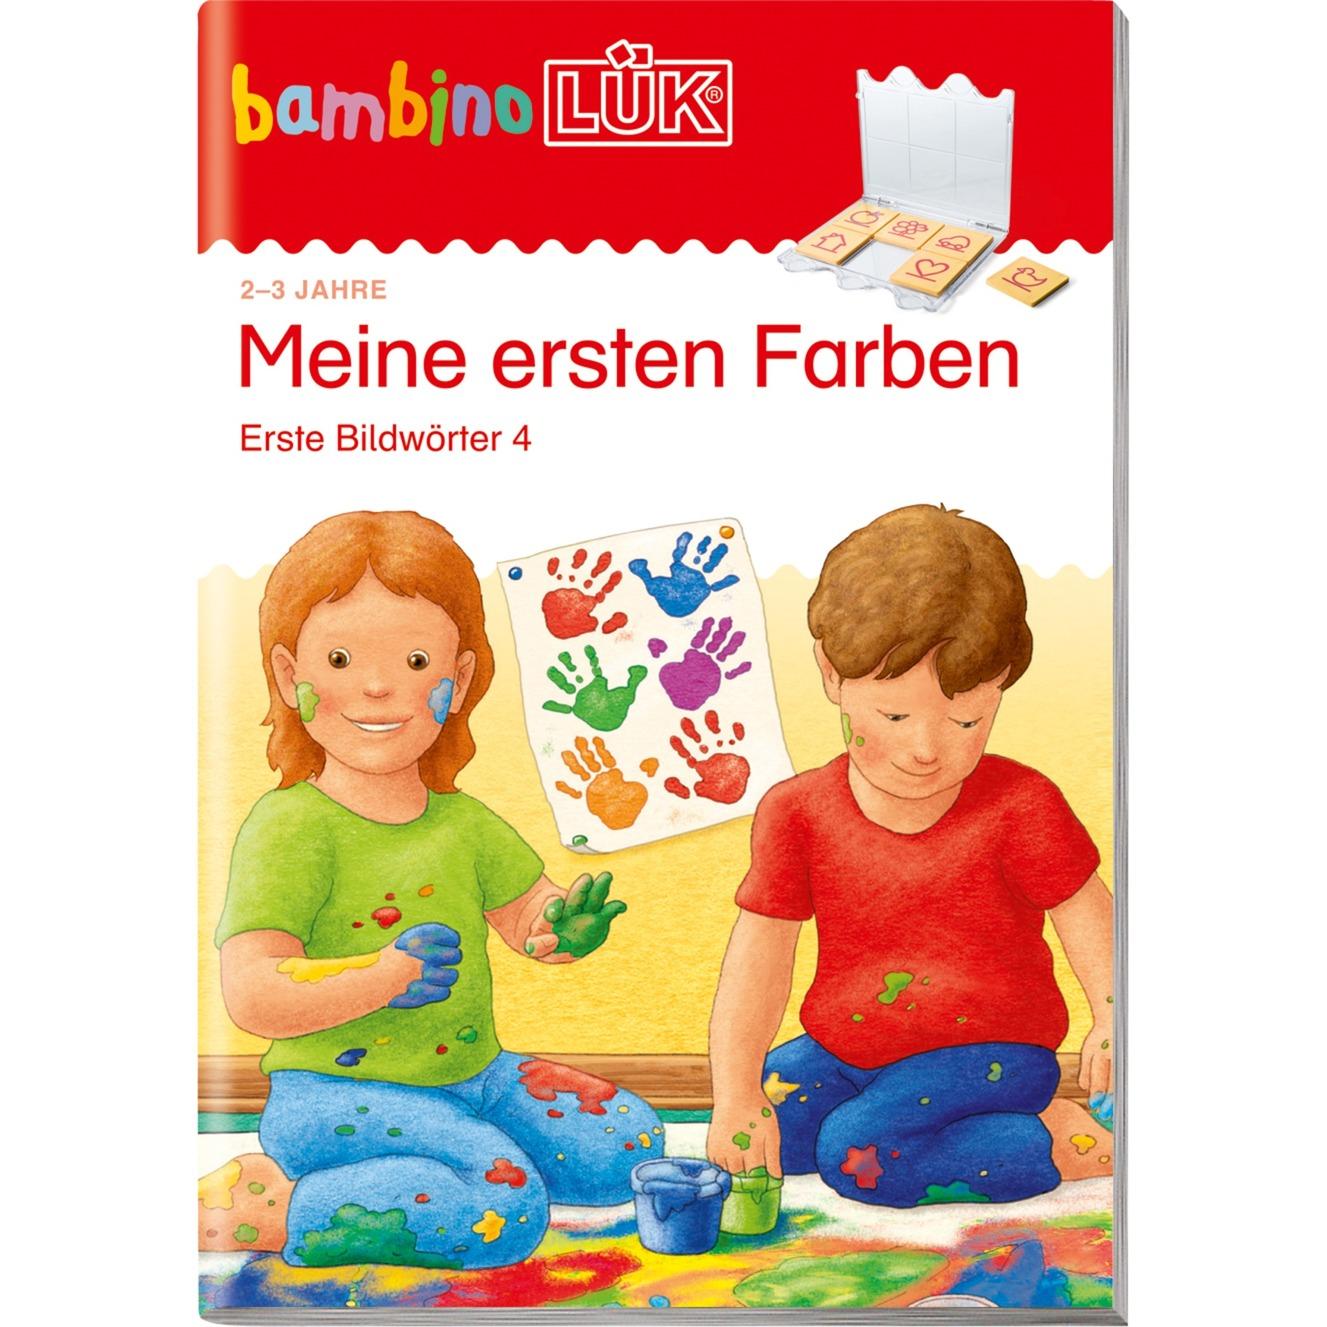 Meine ersten Farben livre pour enfants, Manuel